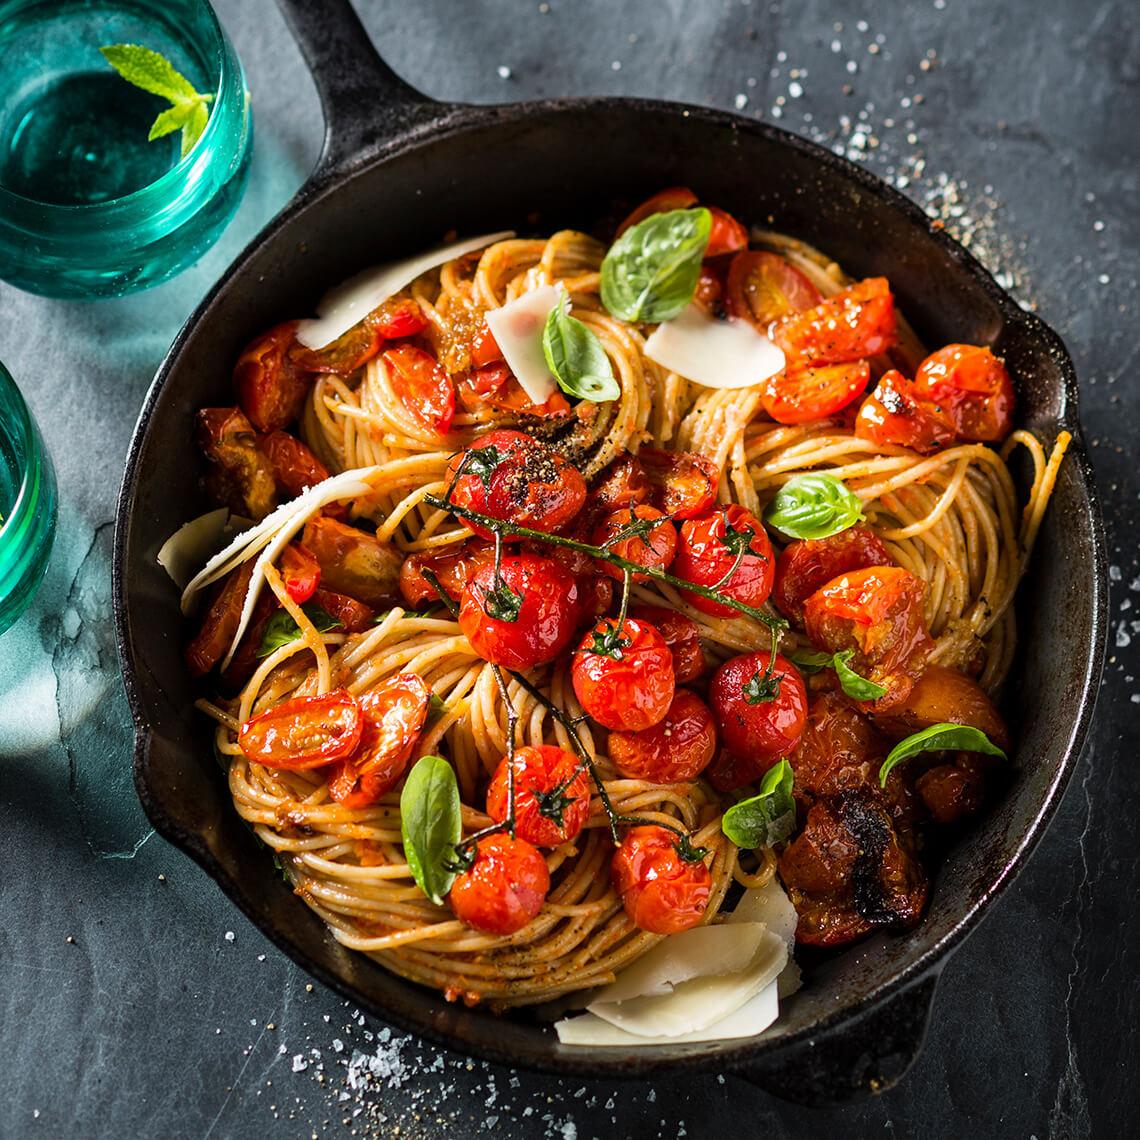 Slow-roasted tomato and basil spaghetti